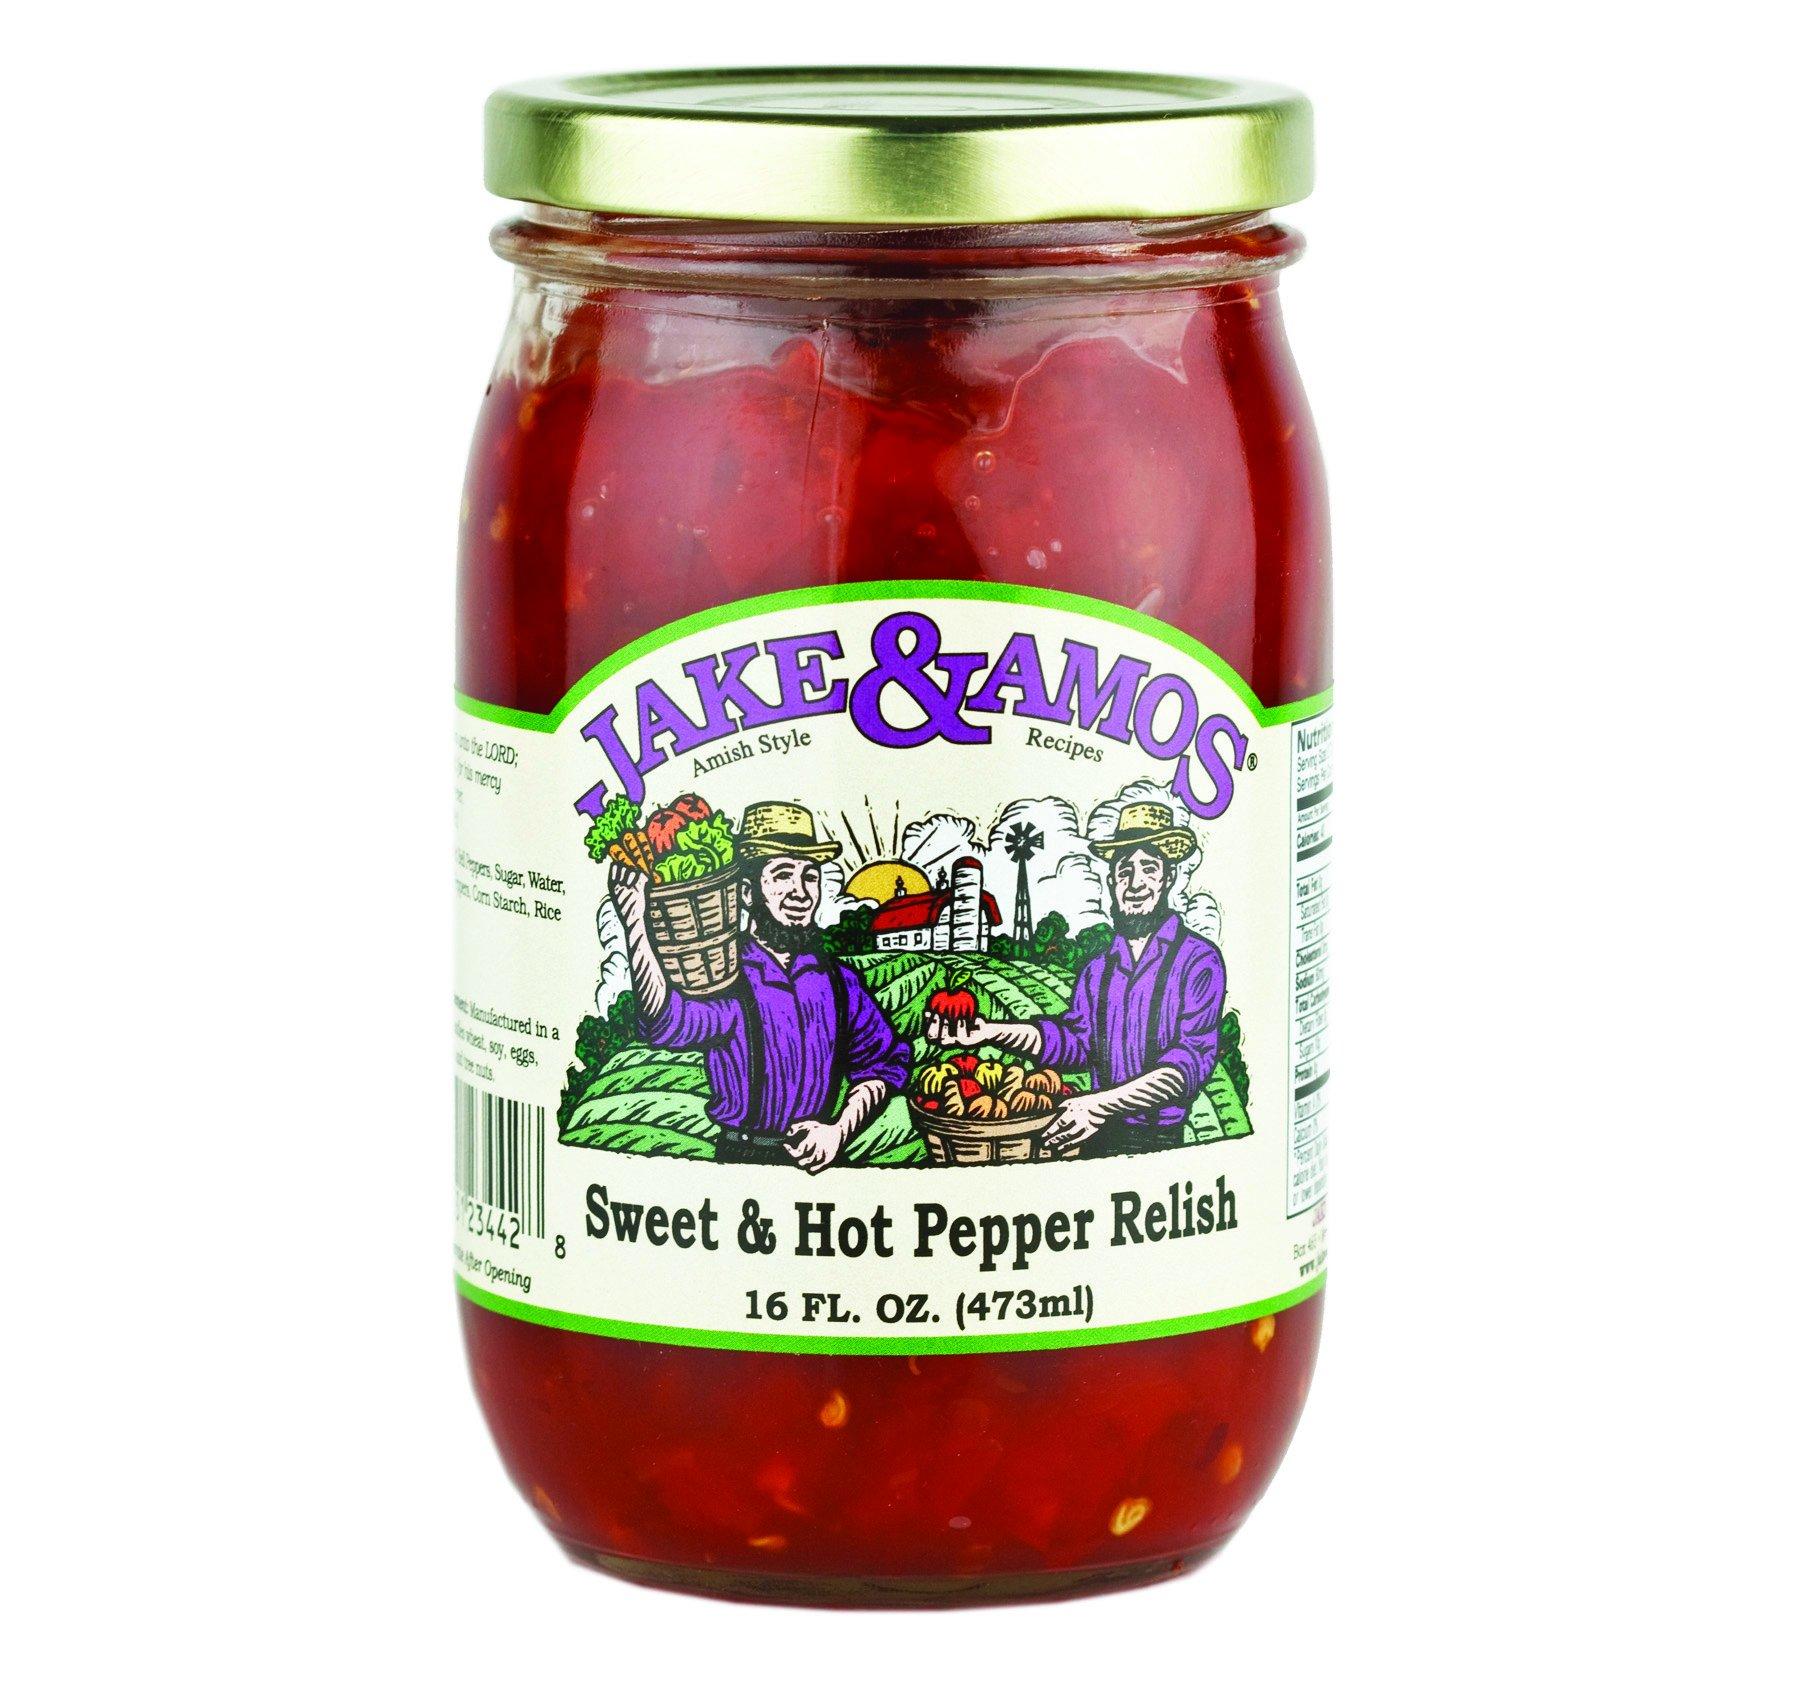 Jake & Amos Sweet & Hot Pepper Relish 16 oz. (3 Jars)